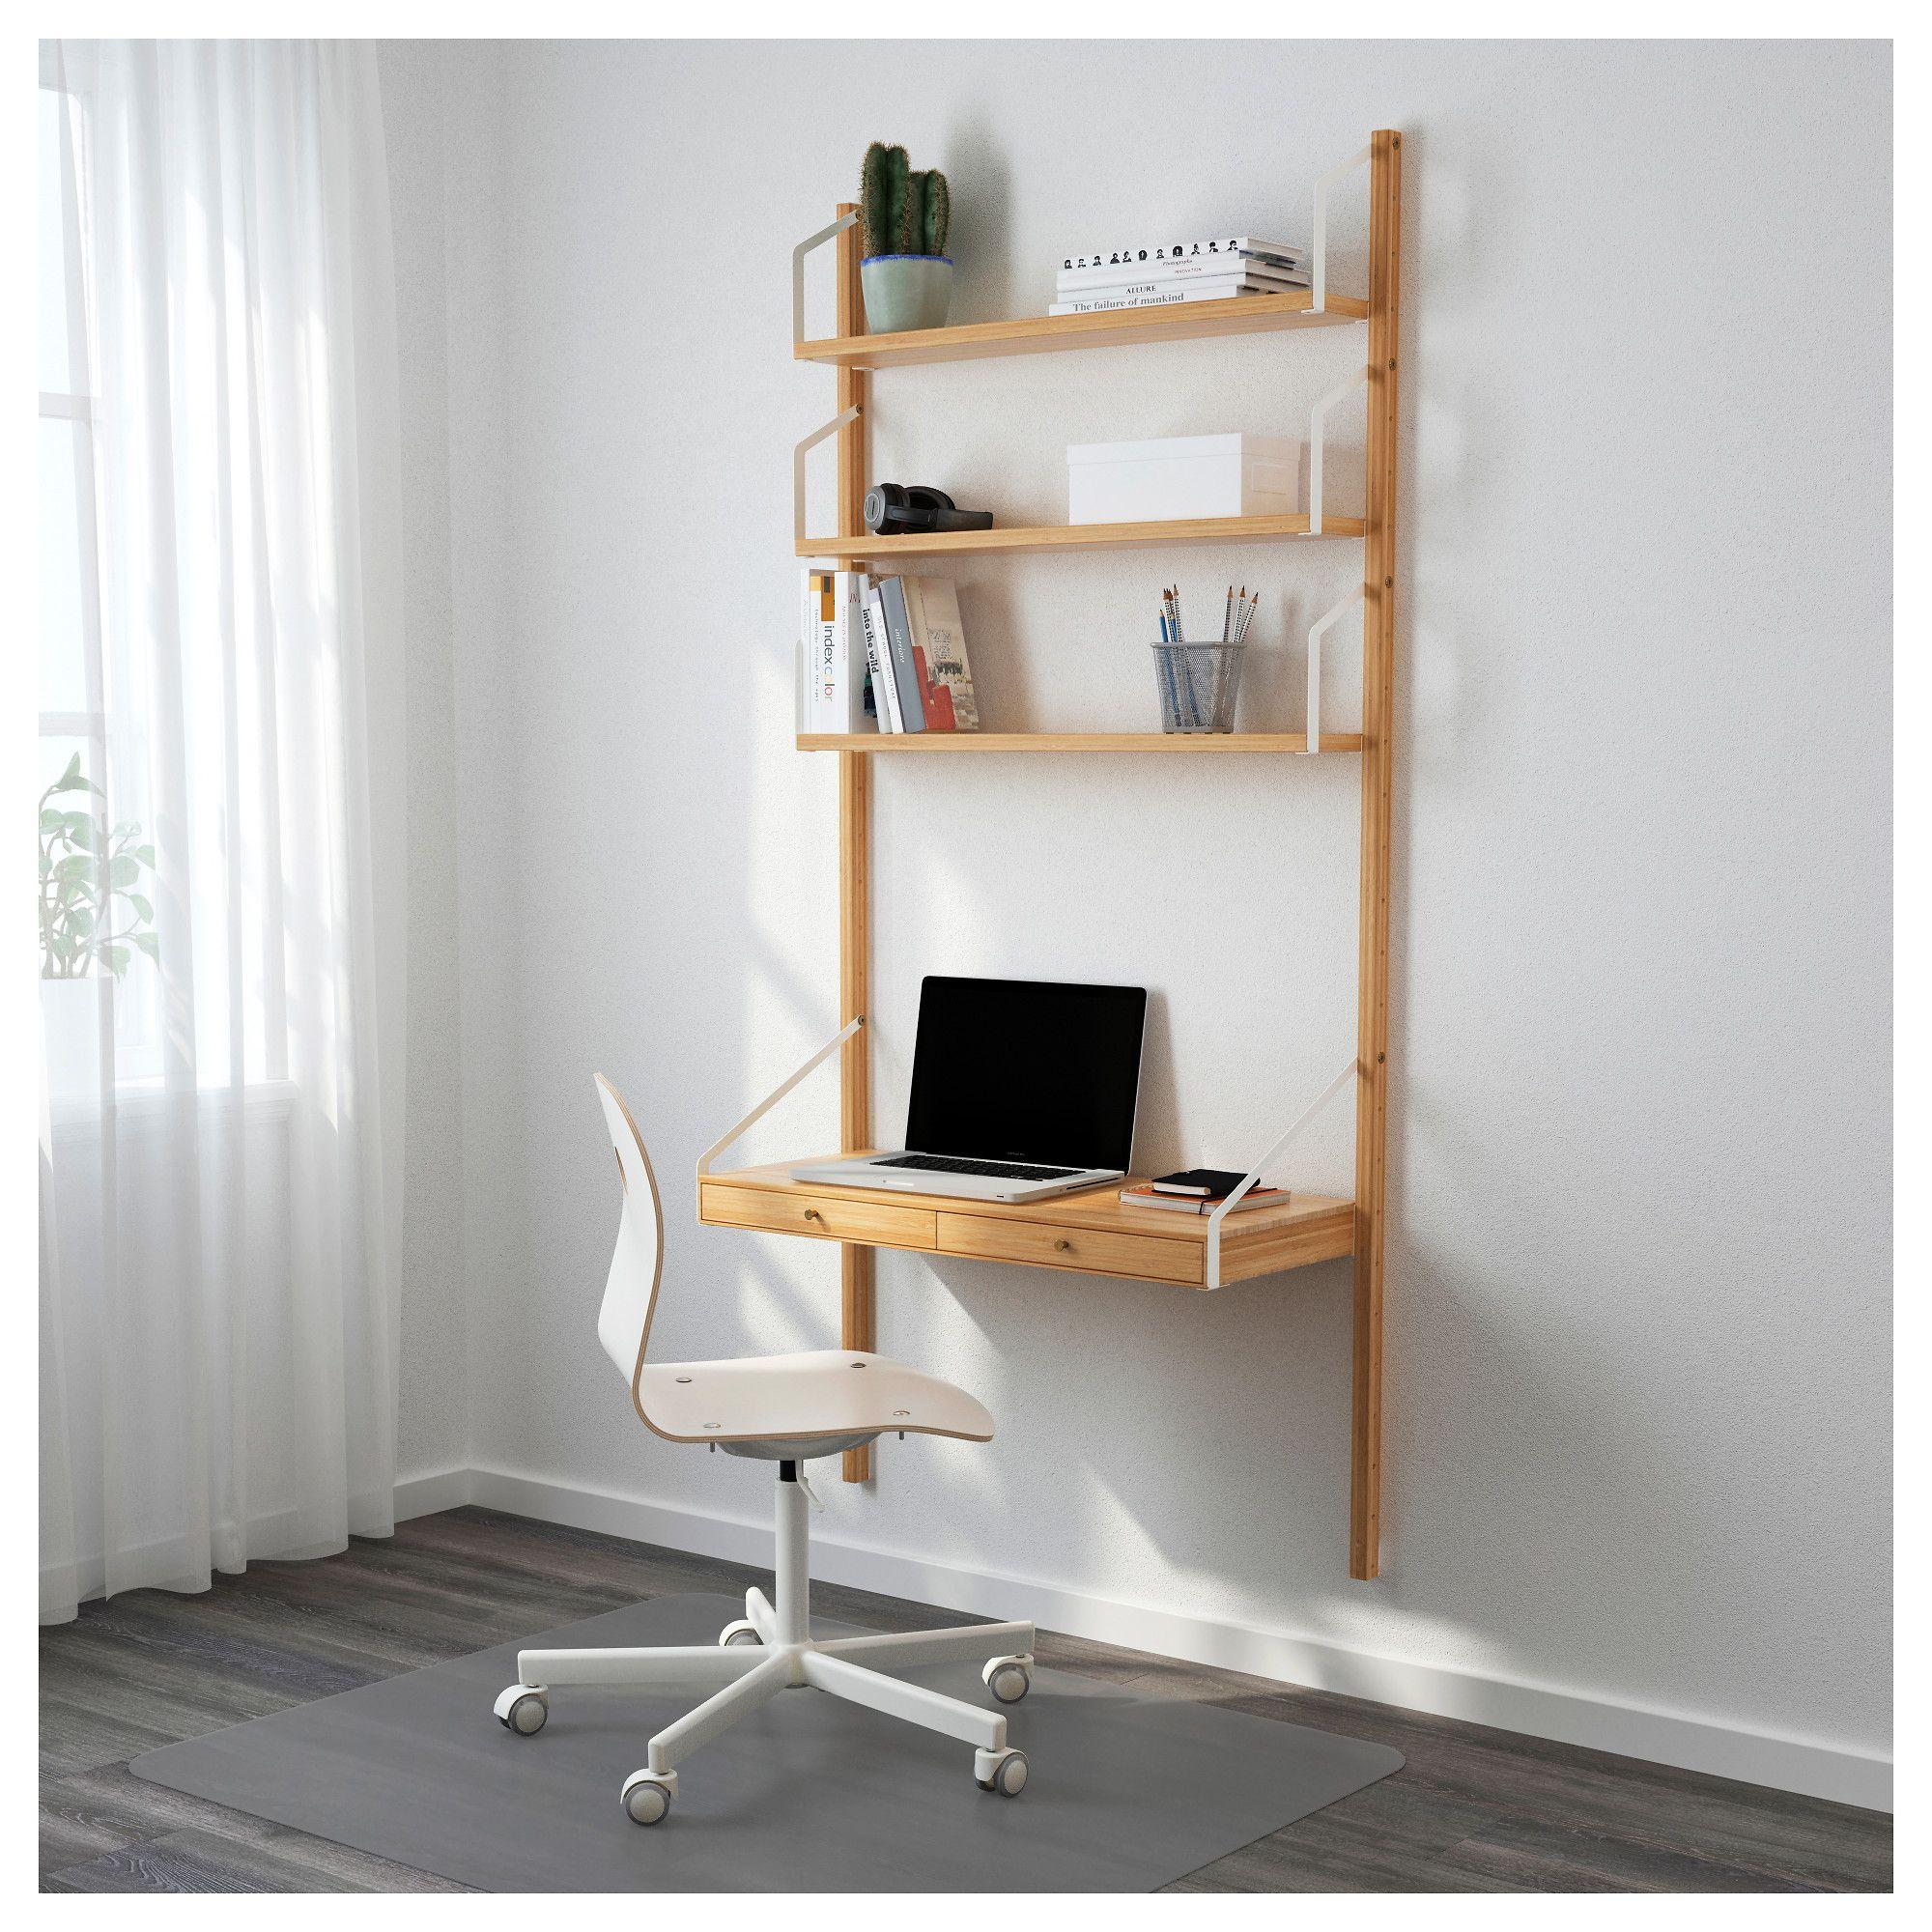 "IKEA SVALN""S Wall mounted storage bination bamboo"